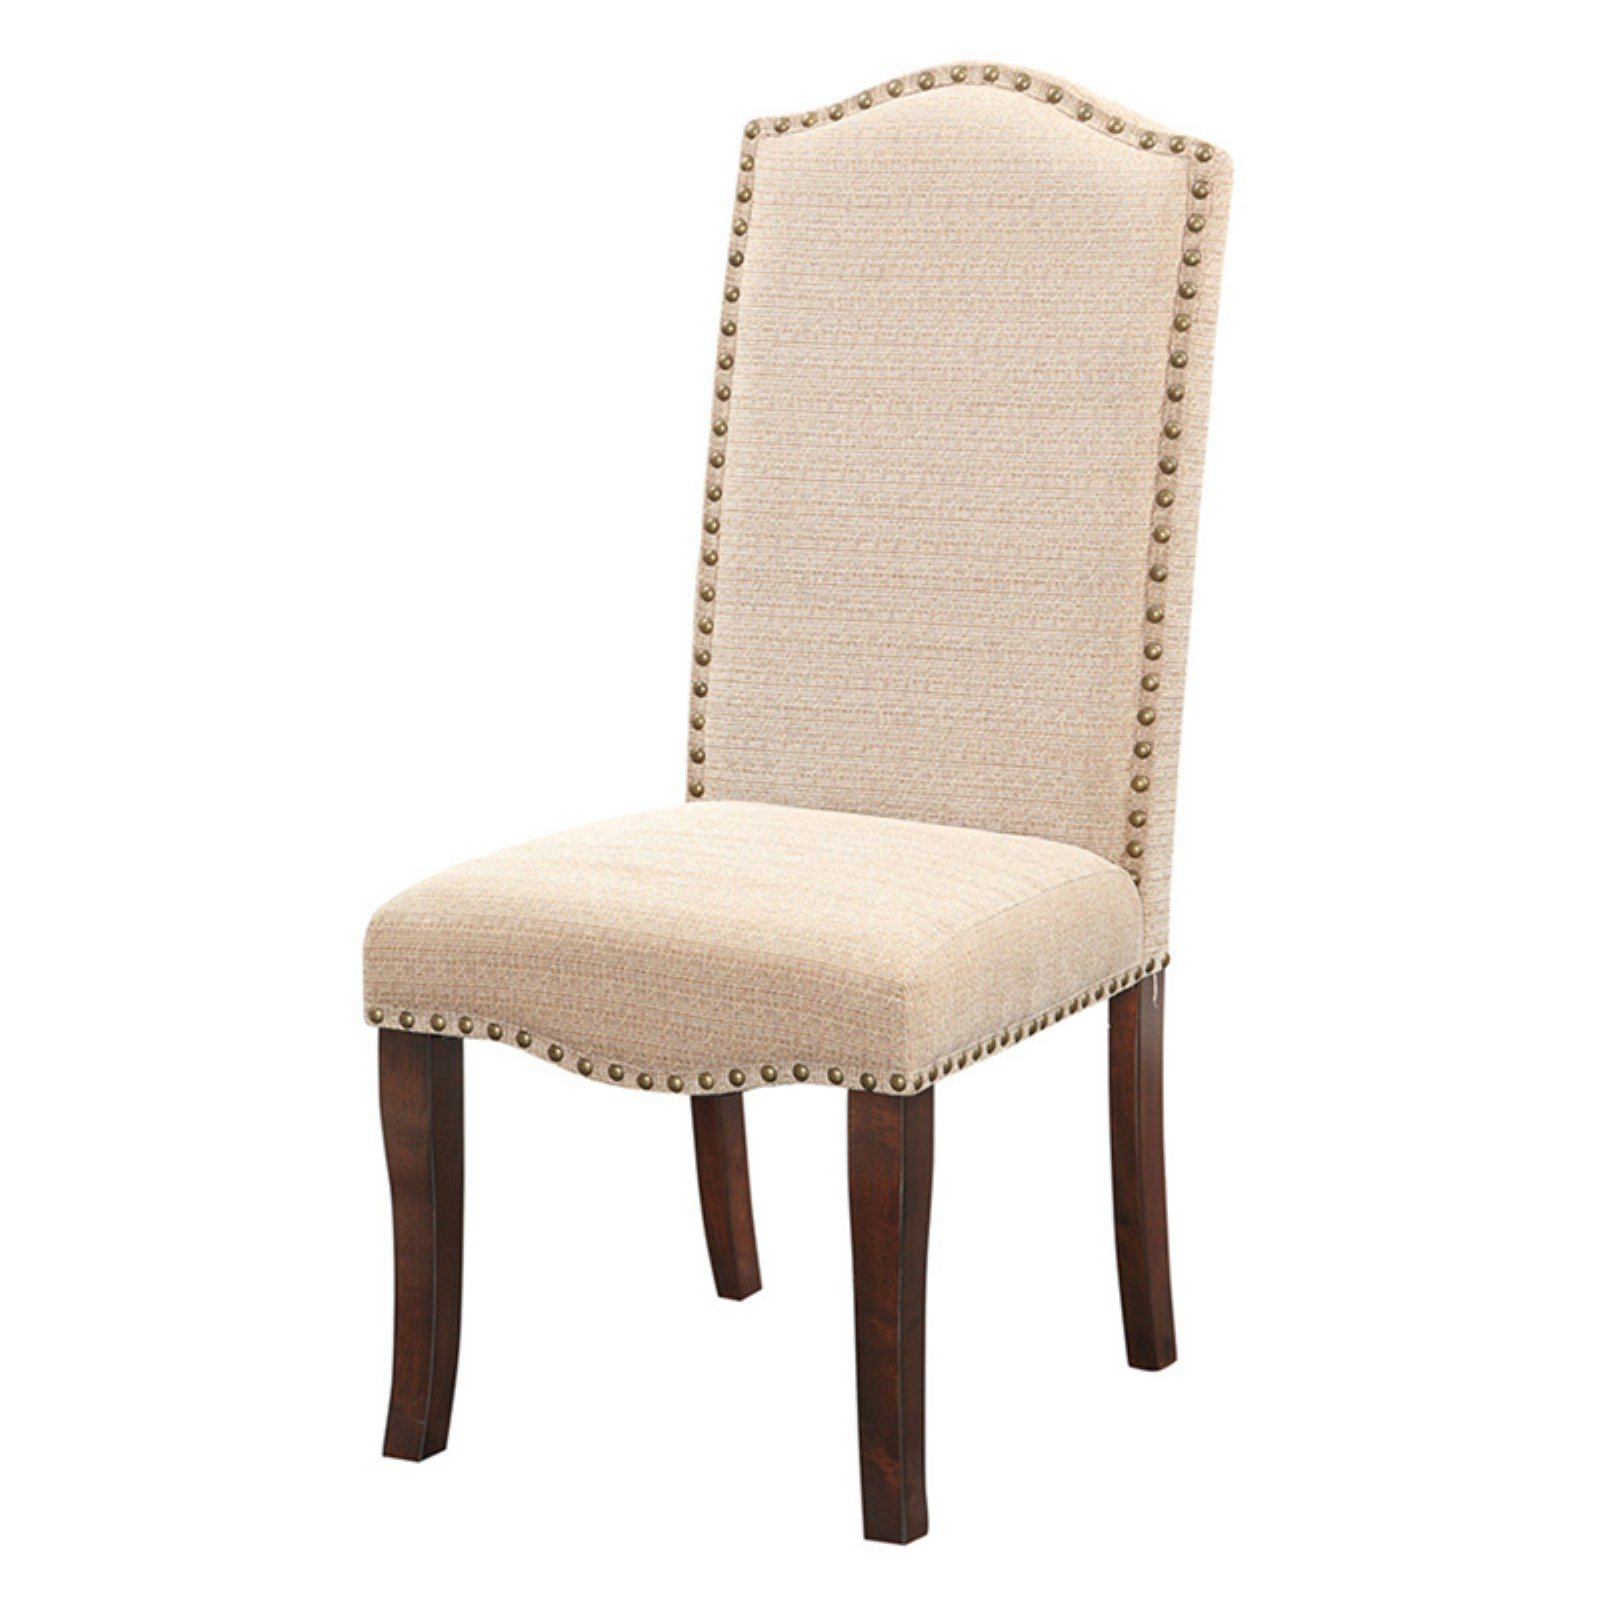 K&B Furniture Upholstered Cream White Dining Chair - Set ...